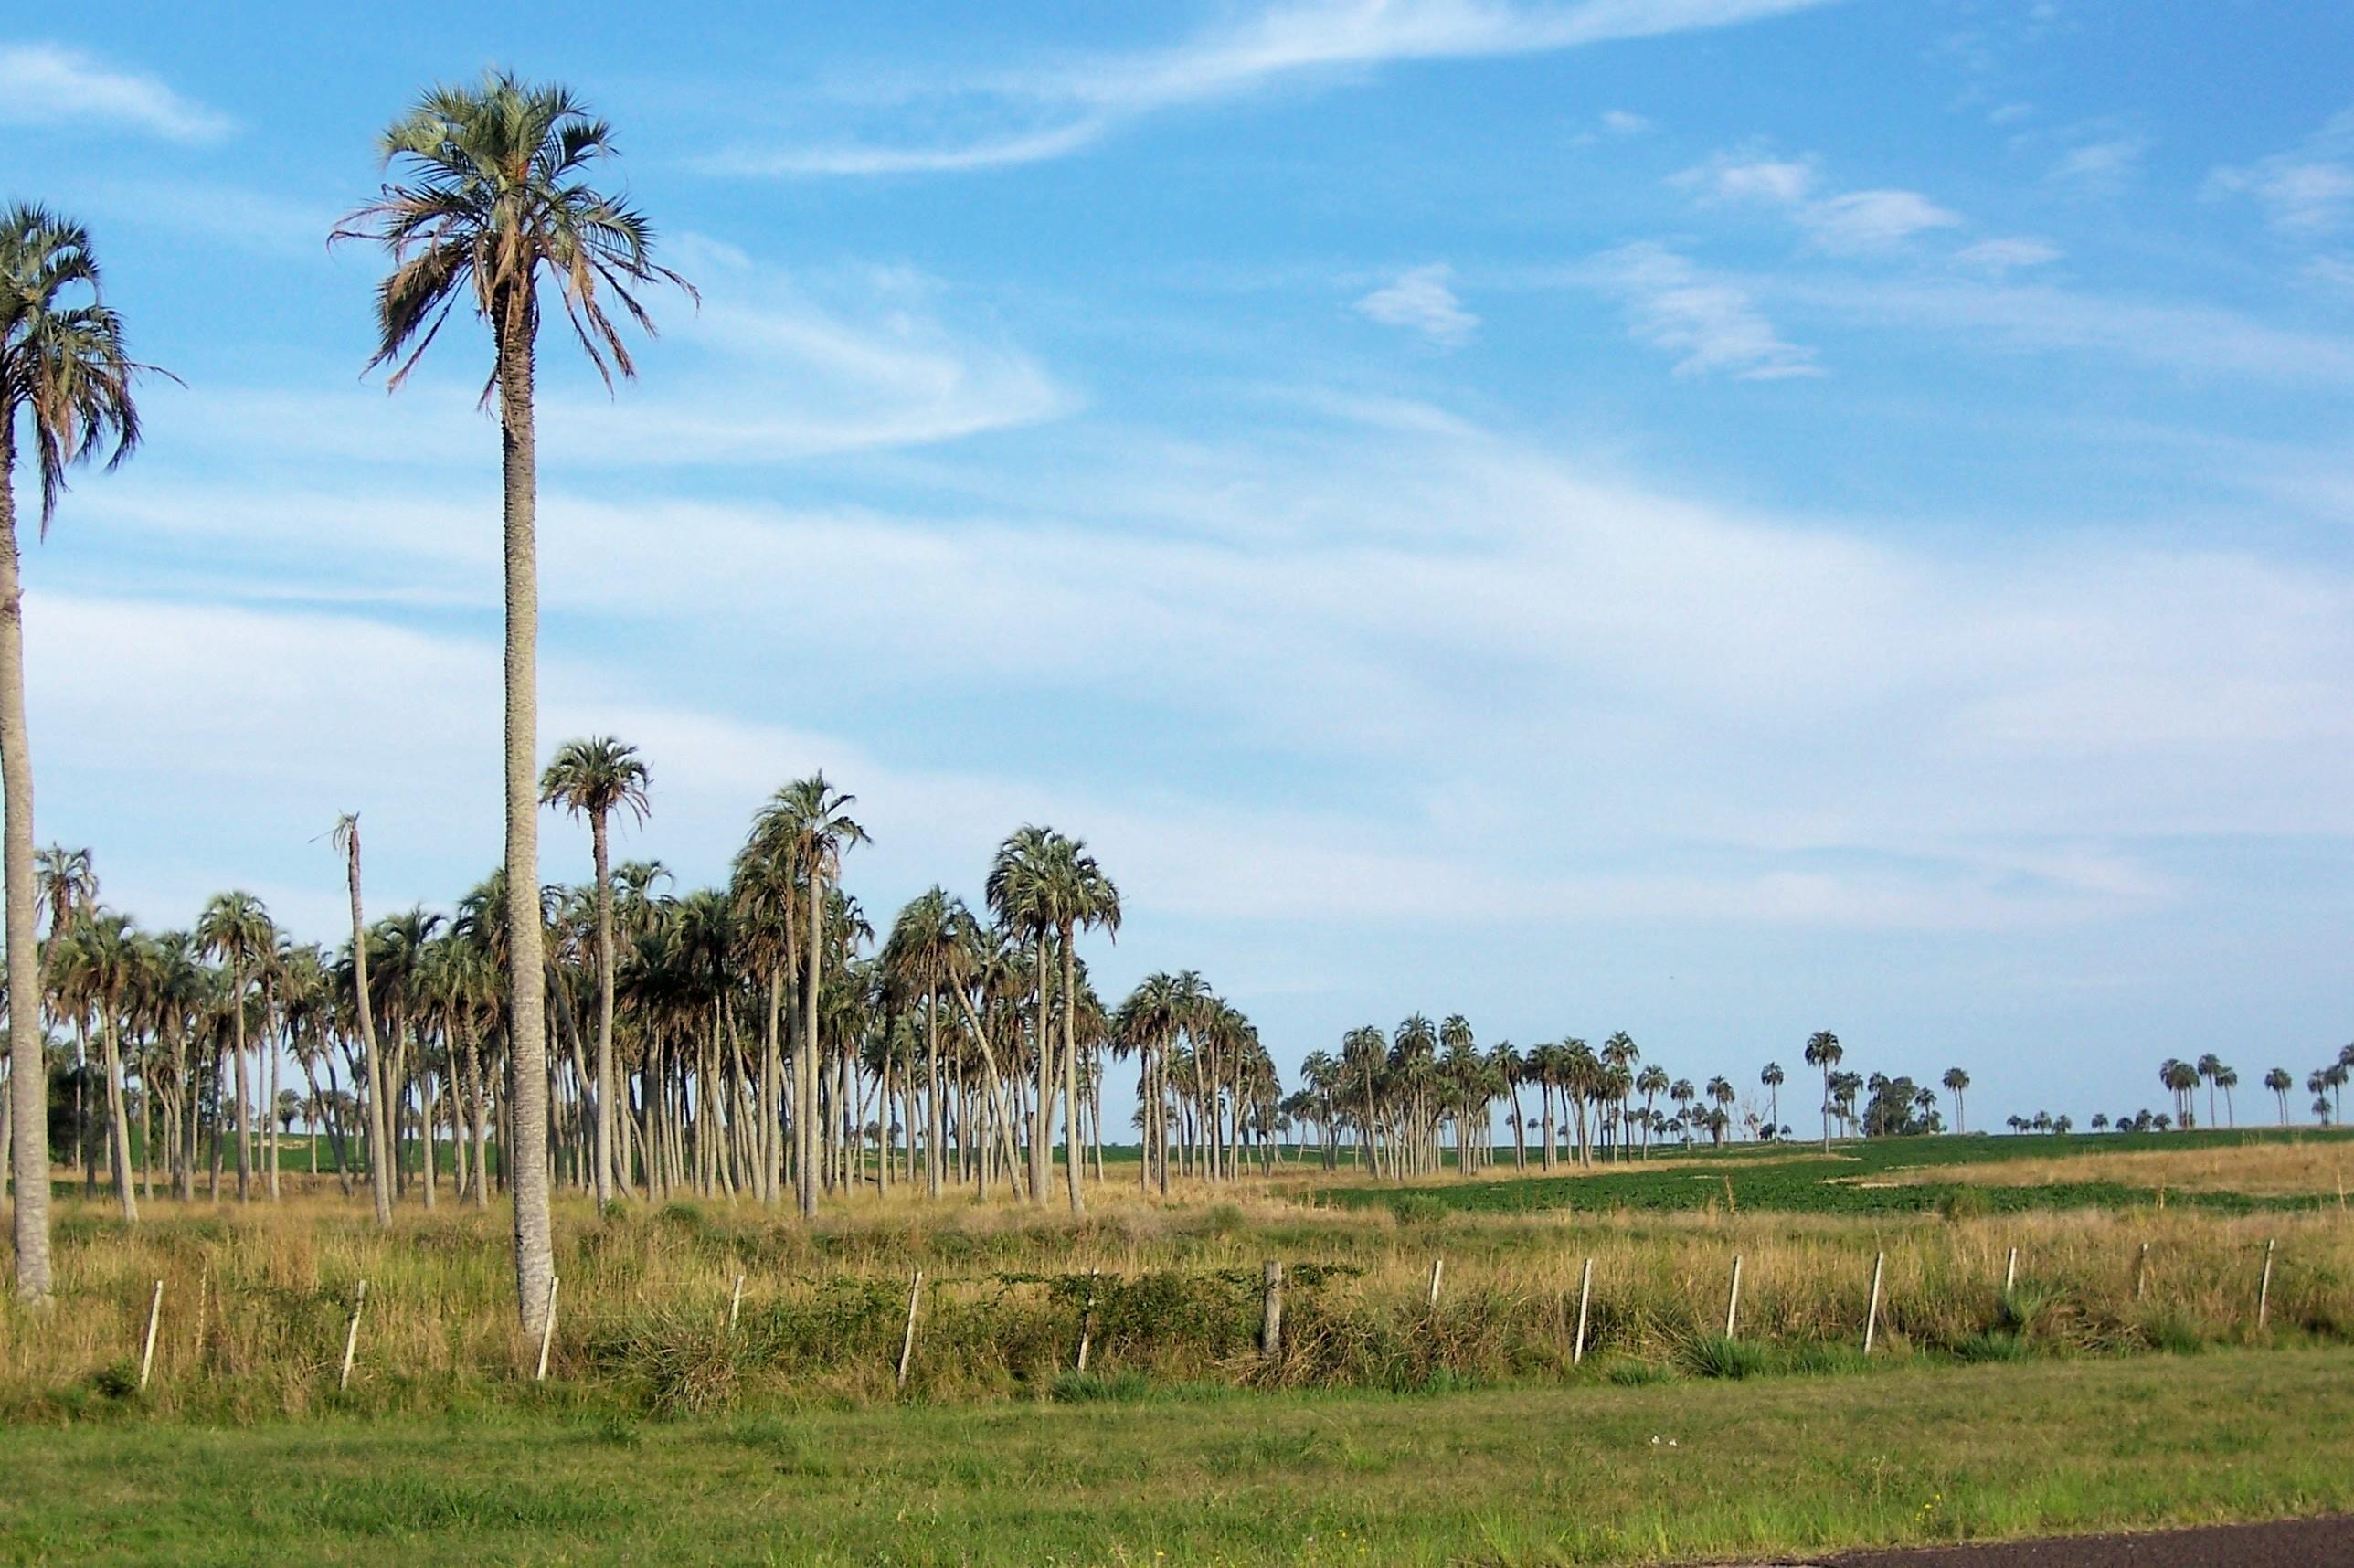 File:Palmares Uruguay Paysandú 03.JPG - Wikimedia Commons